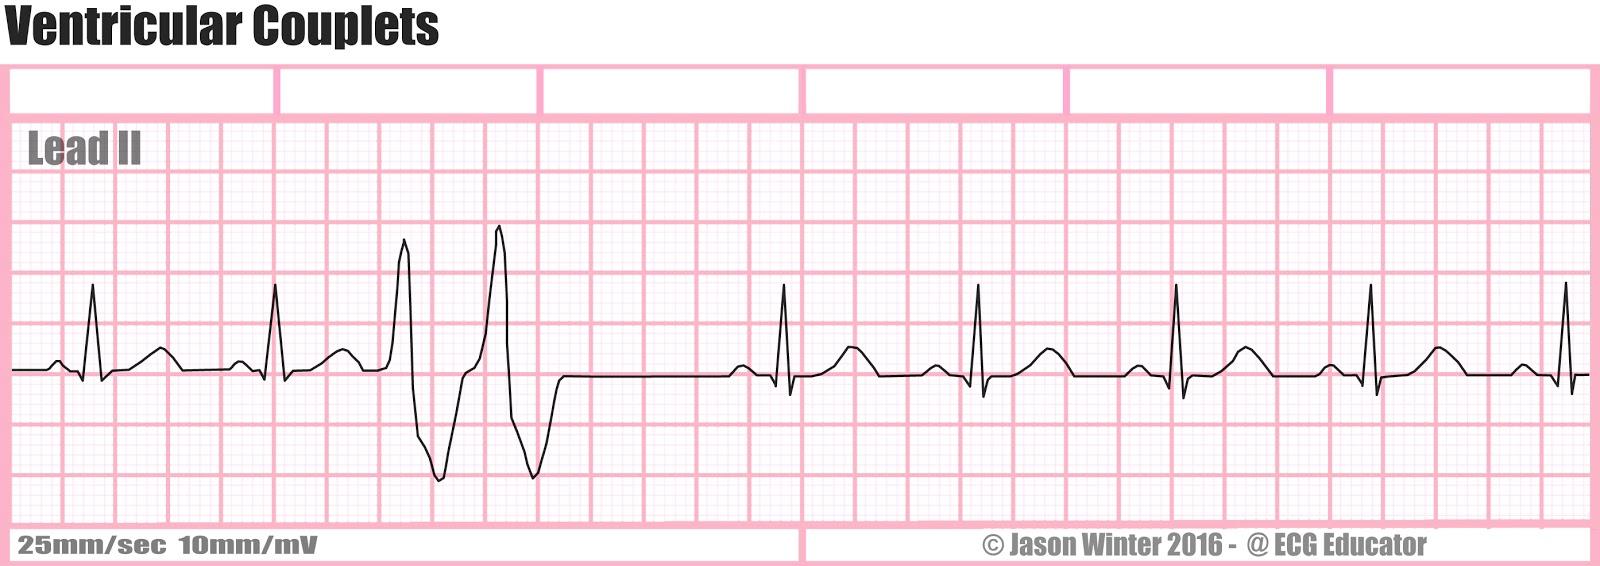 Ventricular Couplets